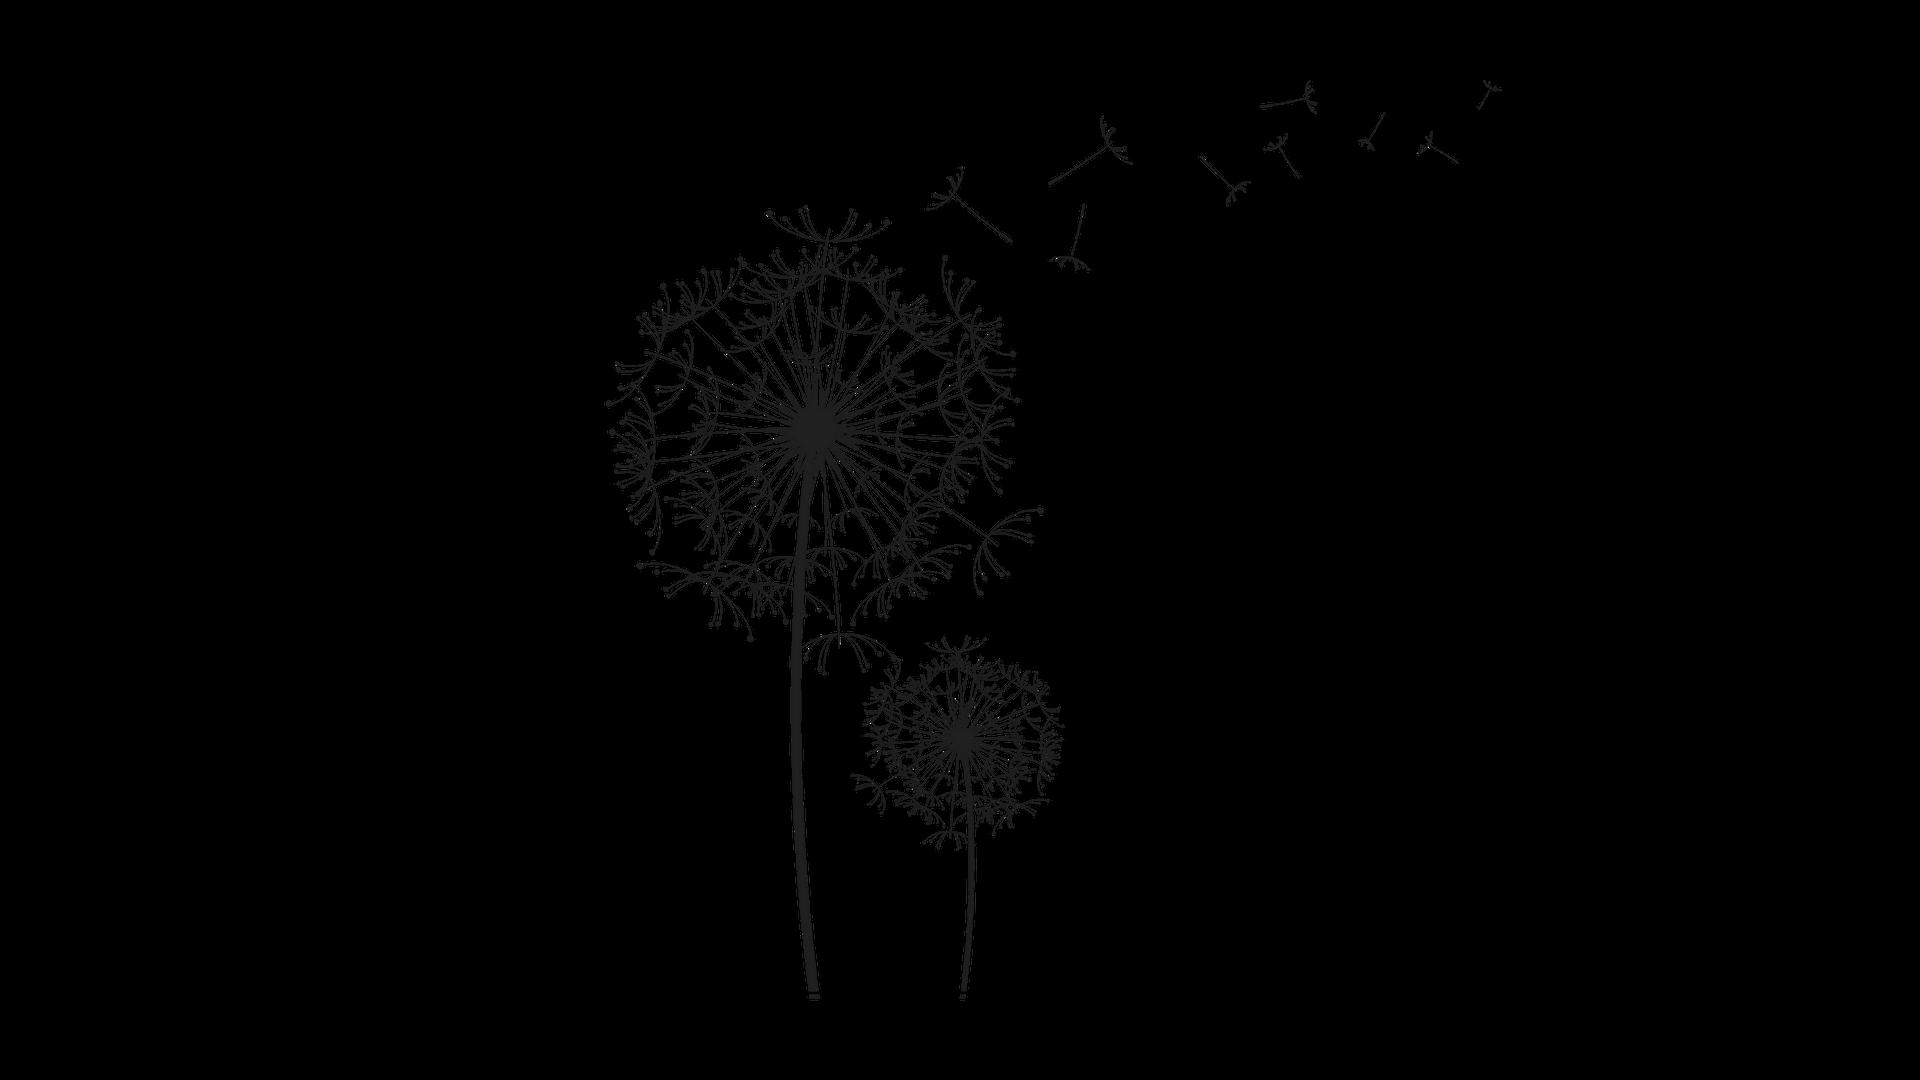 Copy of Dandelion, website images copy.png